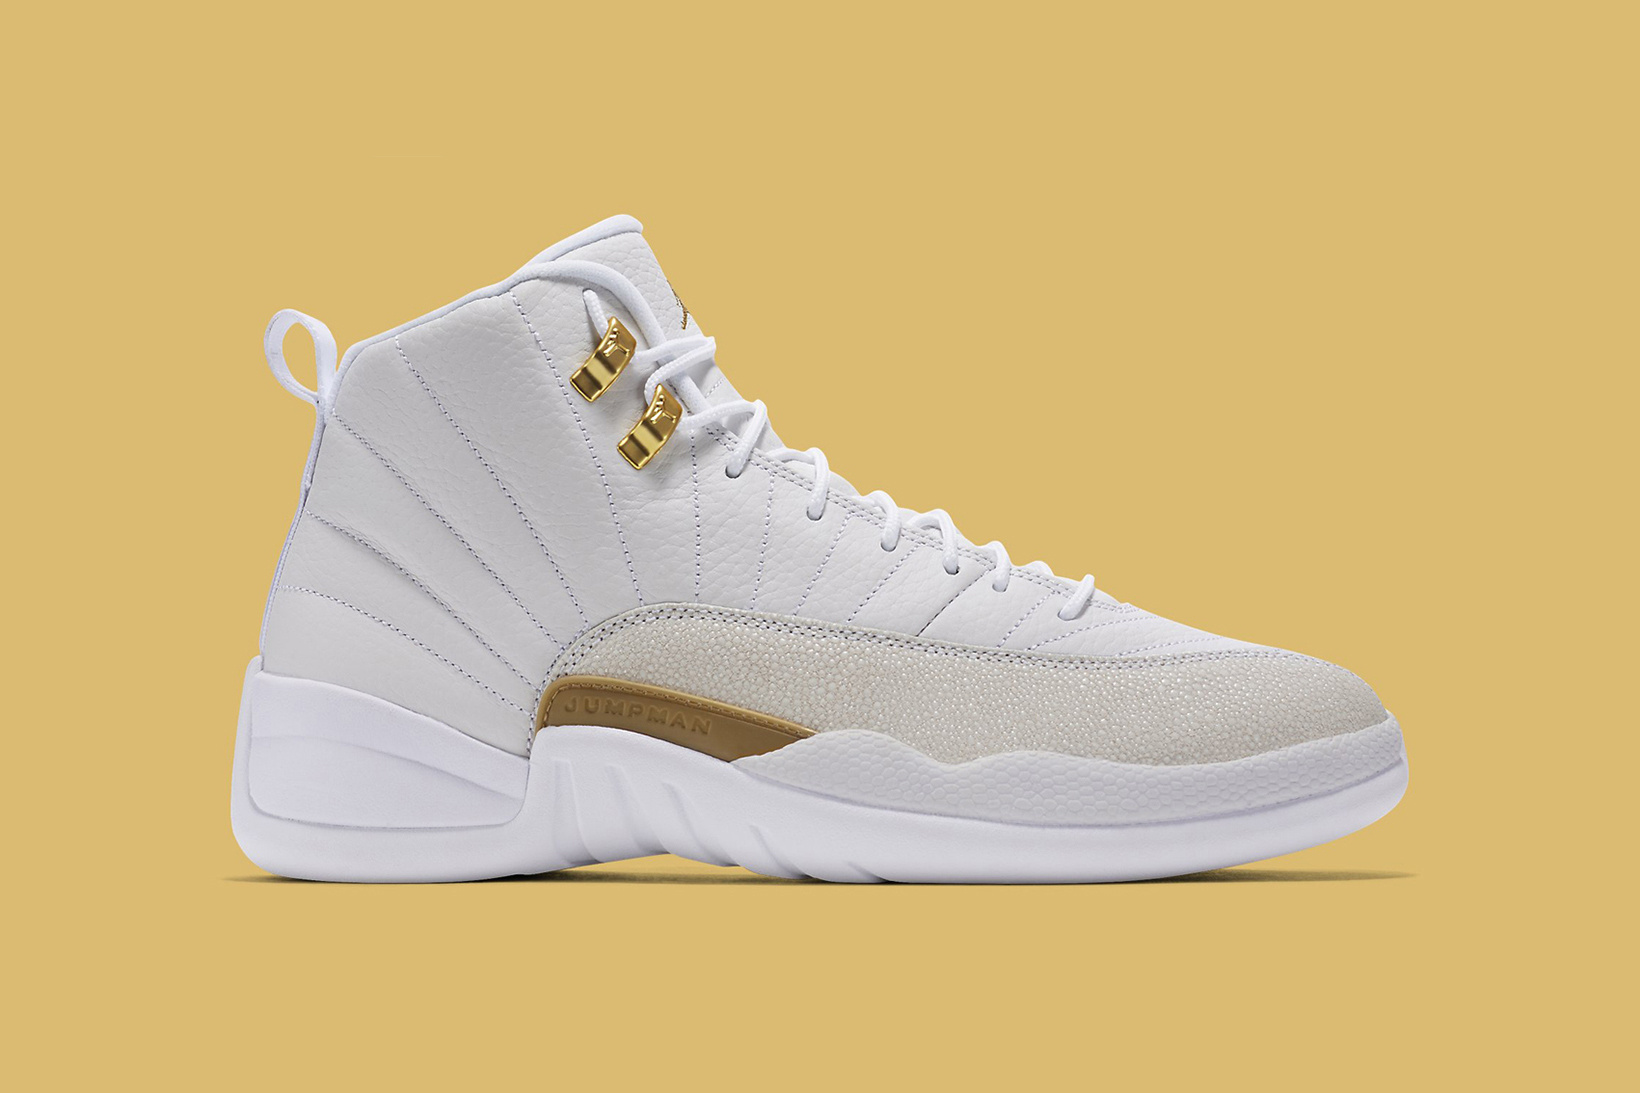 Nike Ovo air Jordan 12